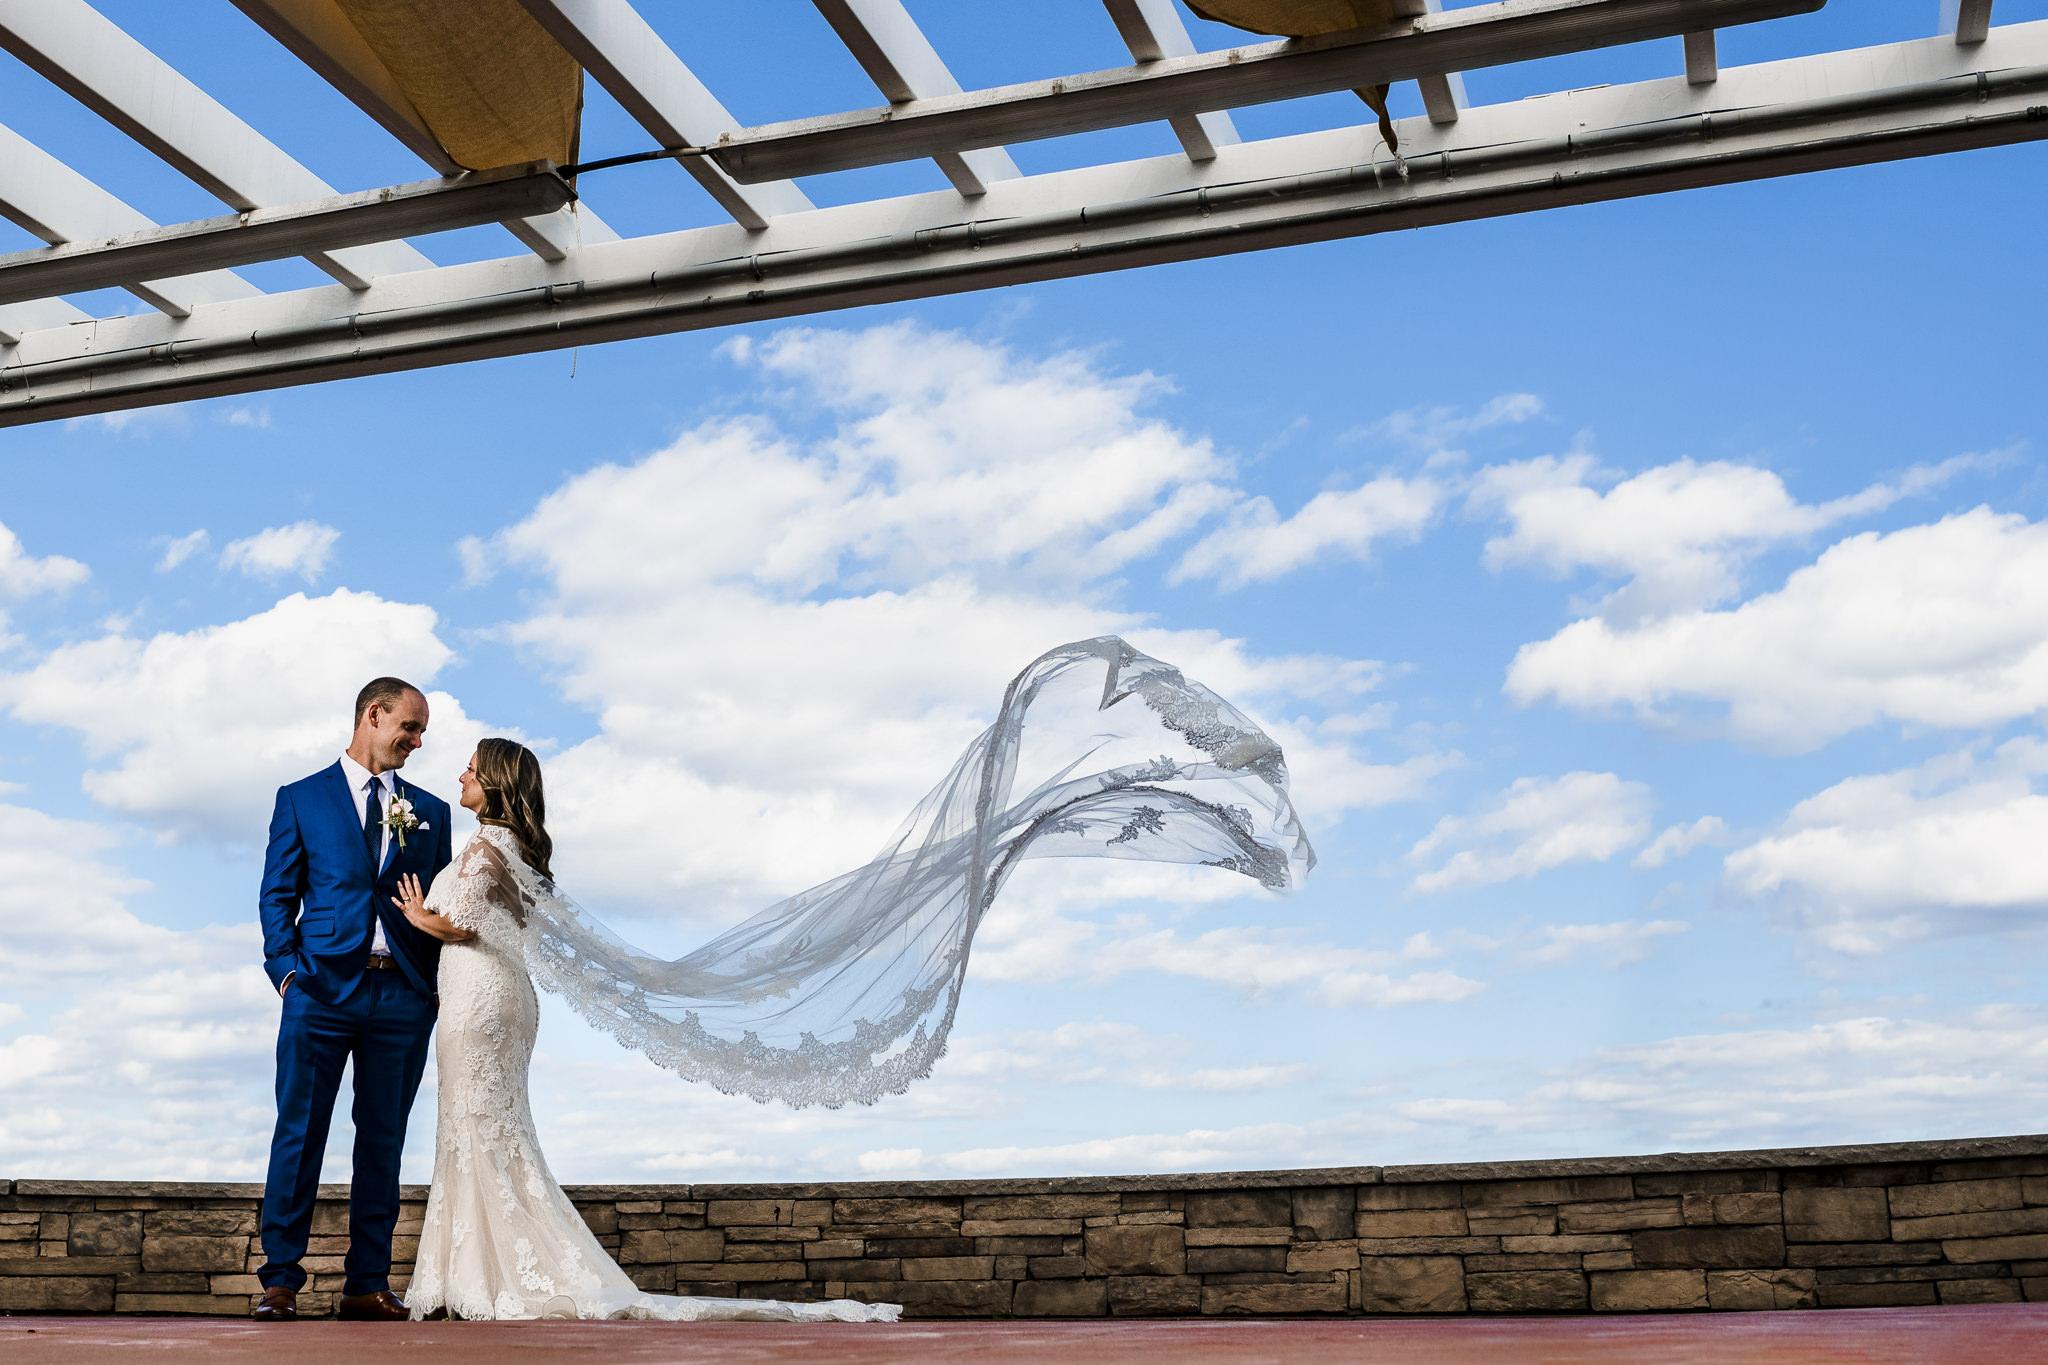 Culos-Sheraton-Eatontown-Long-Branch-Wedding-Photographer-08.JPG